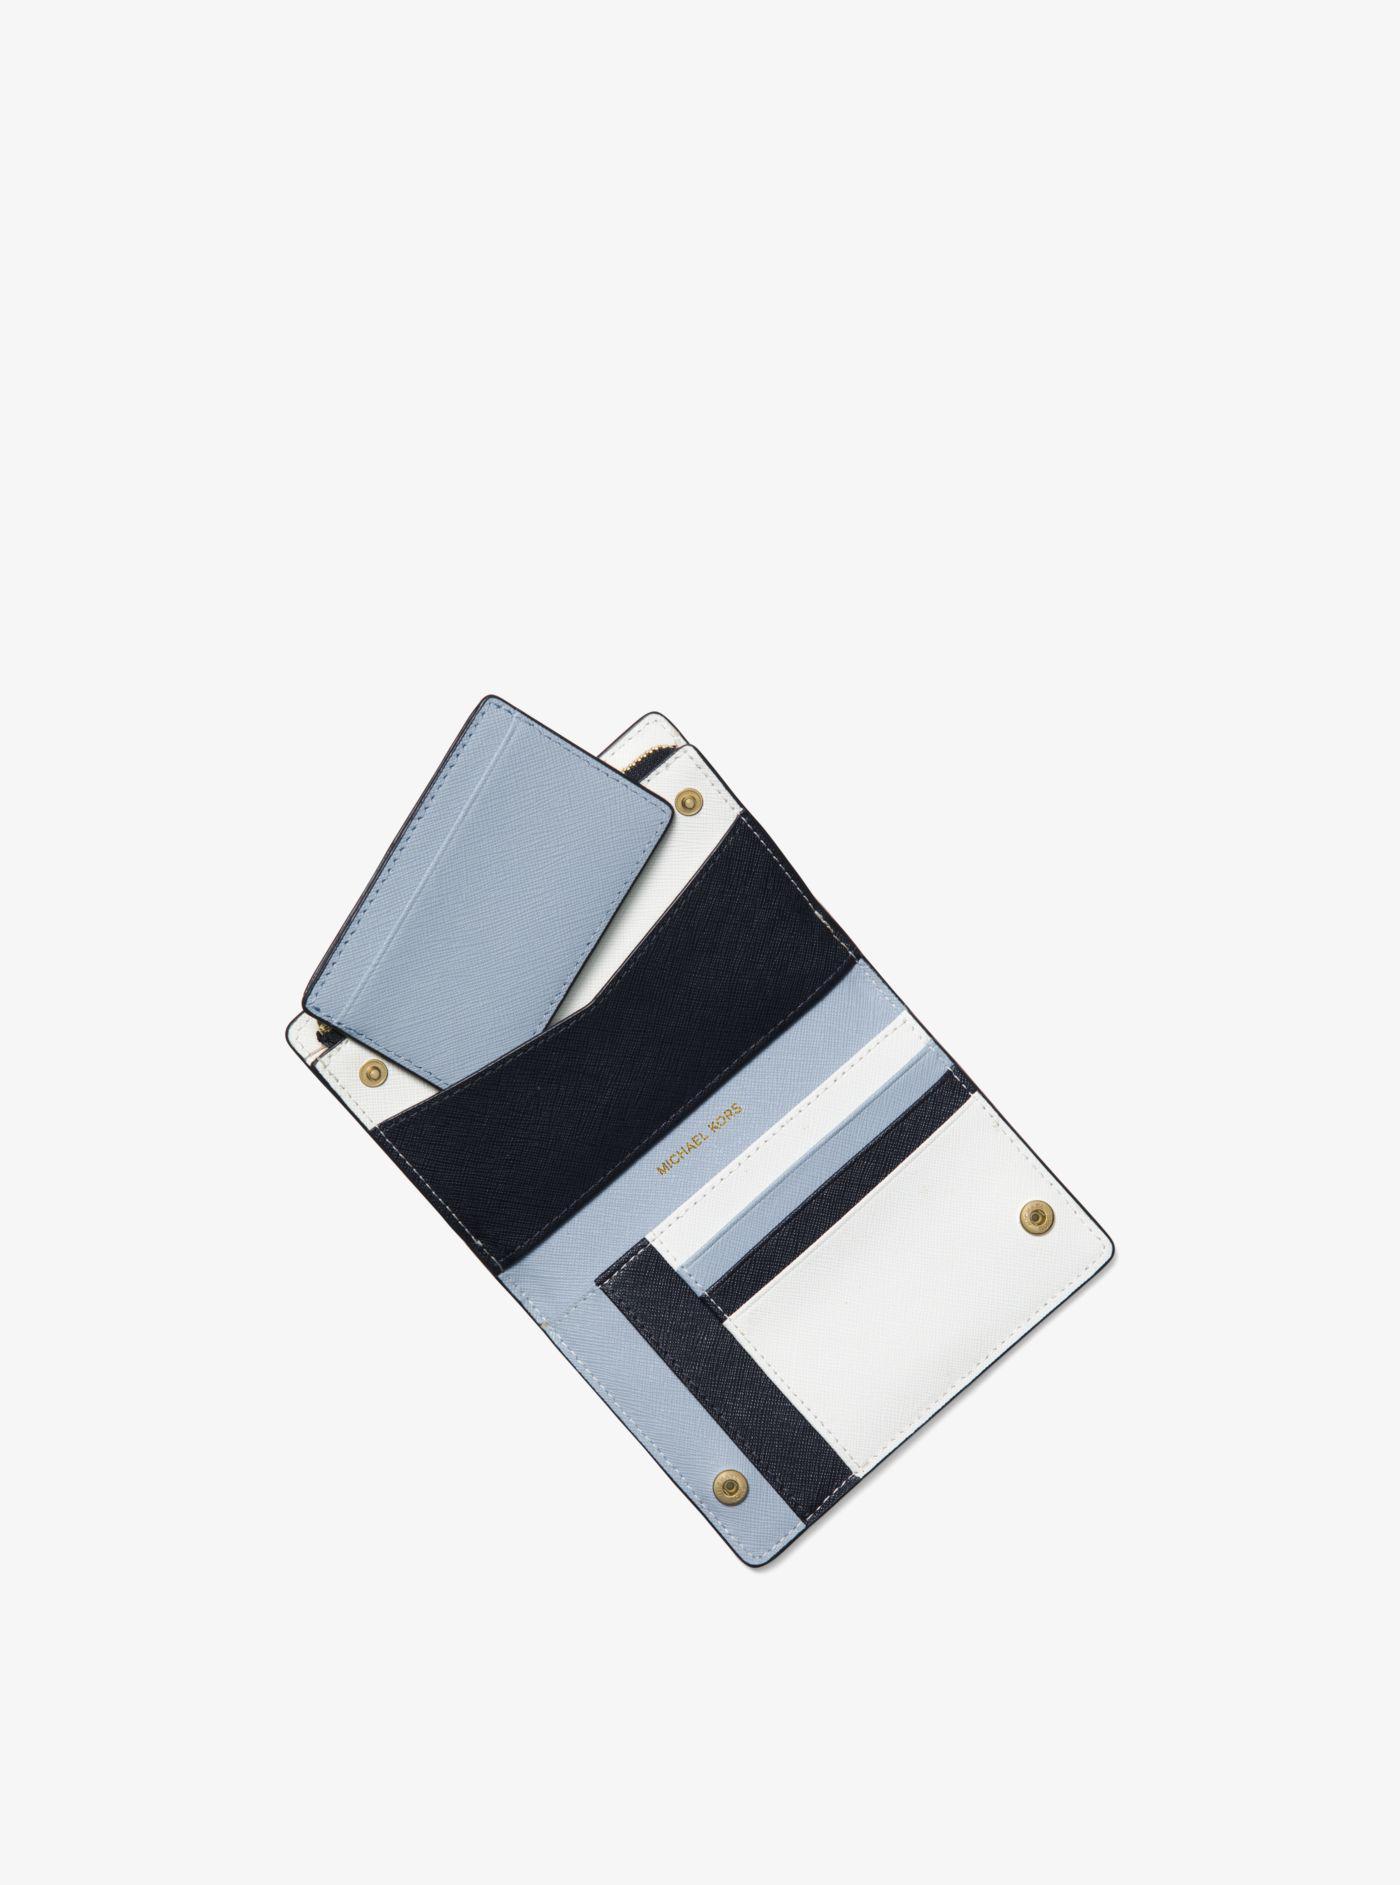 4f38ac890e65 Michael Kors Medium Saffiano Leather Slim Wallet in Blue - Lyst